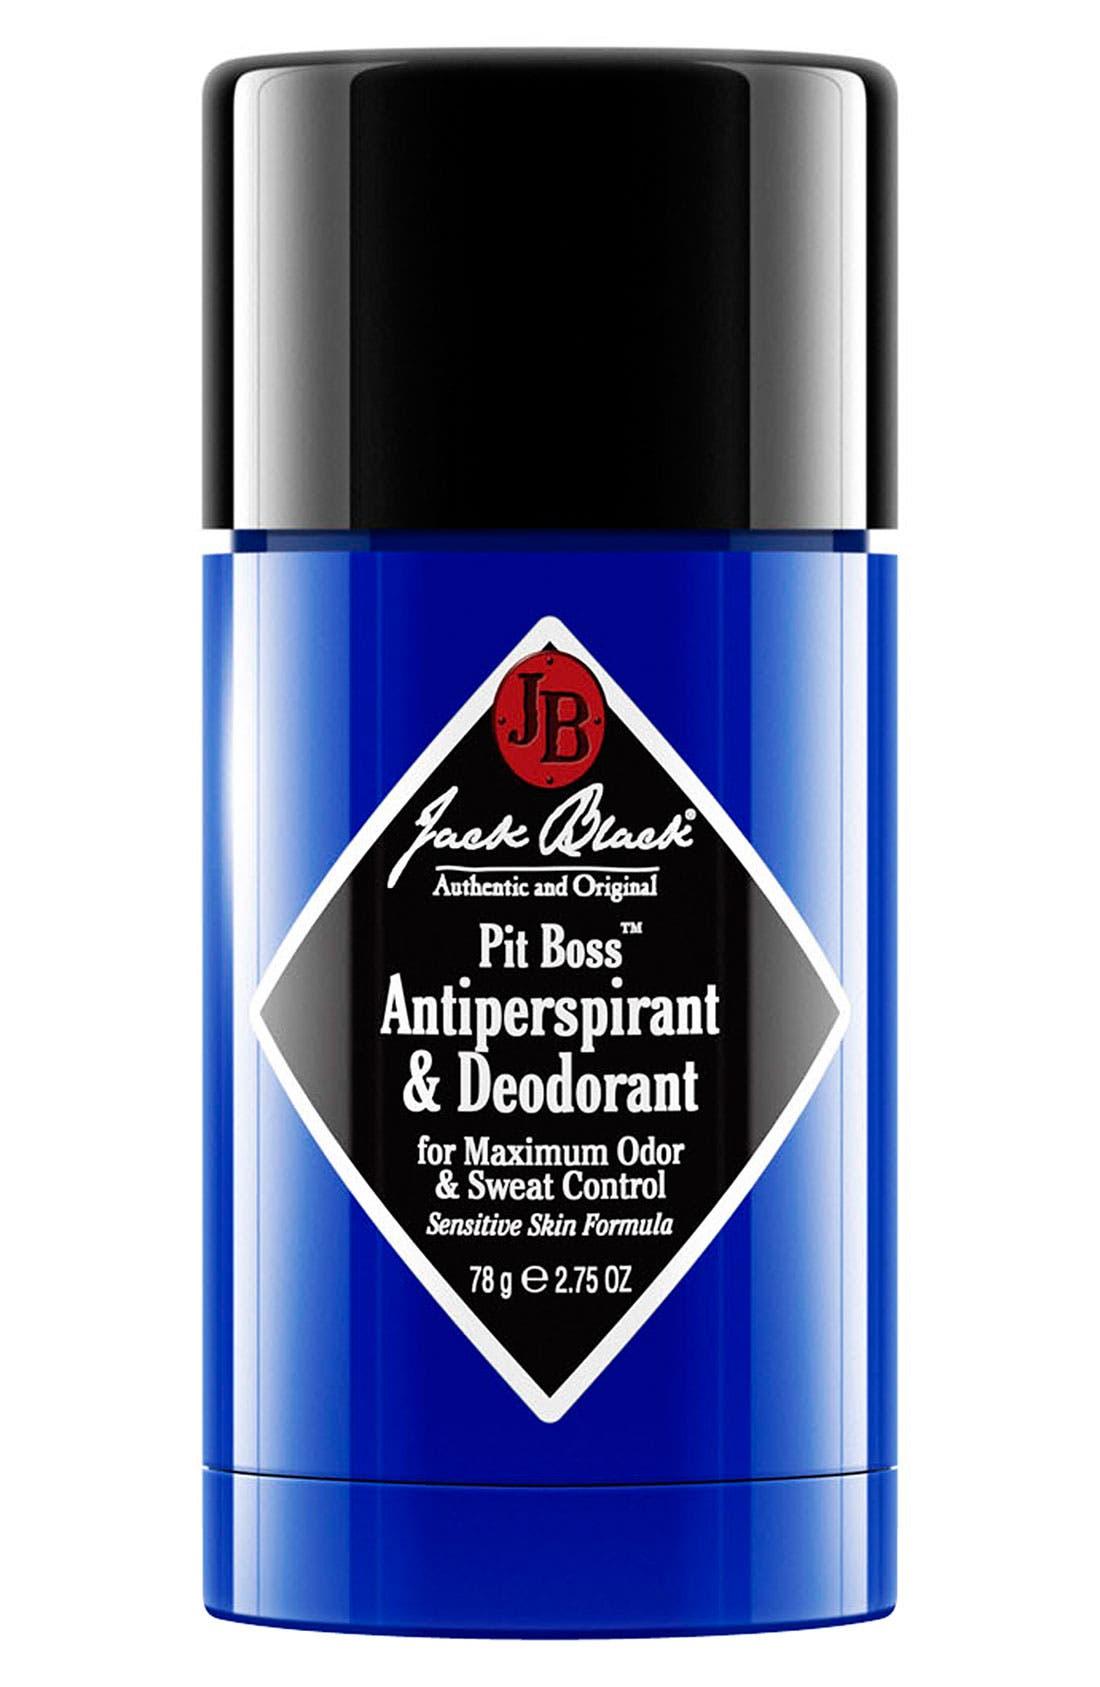 Jack Black 'Pit Boss' Antiperspirant & Deodorant